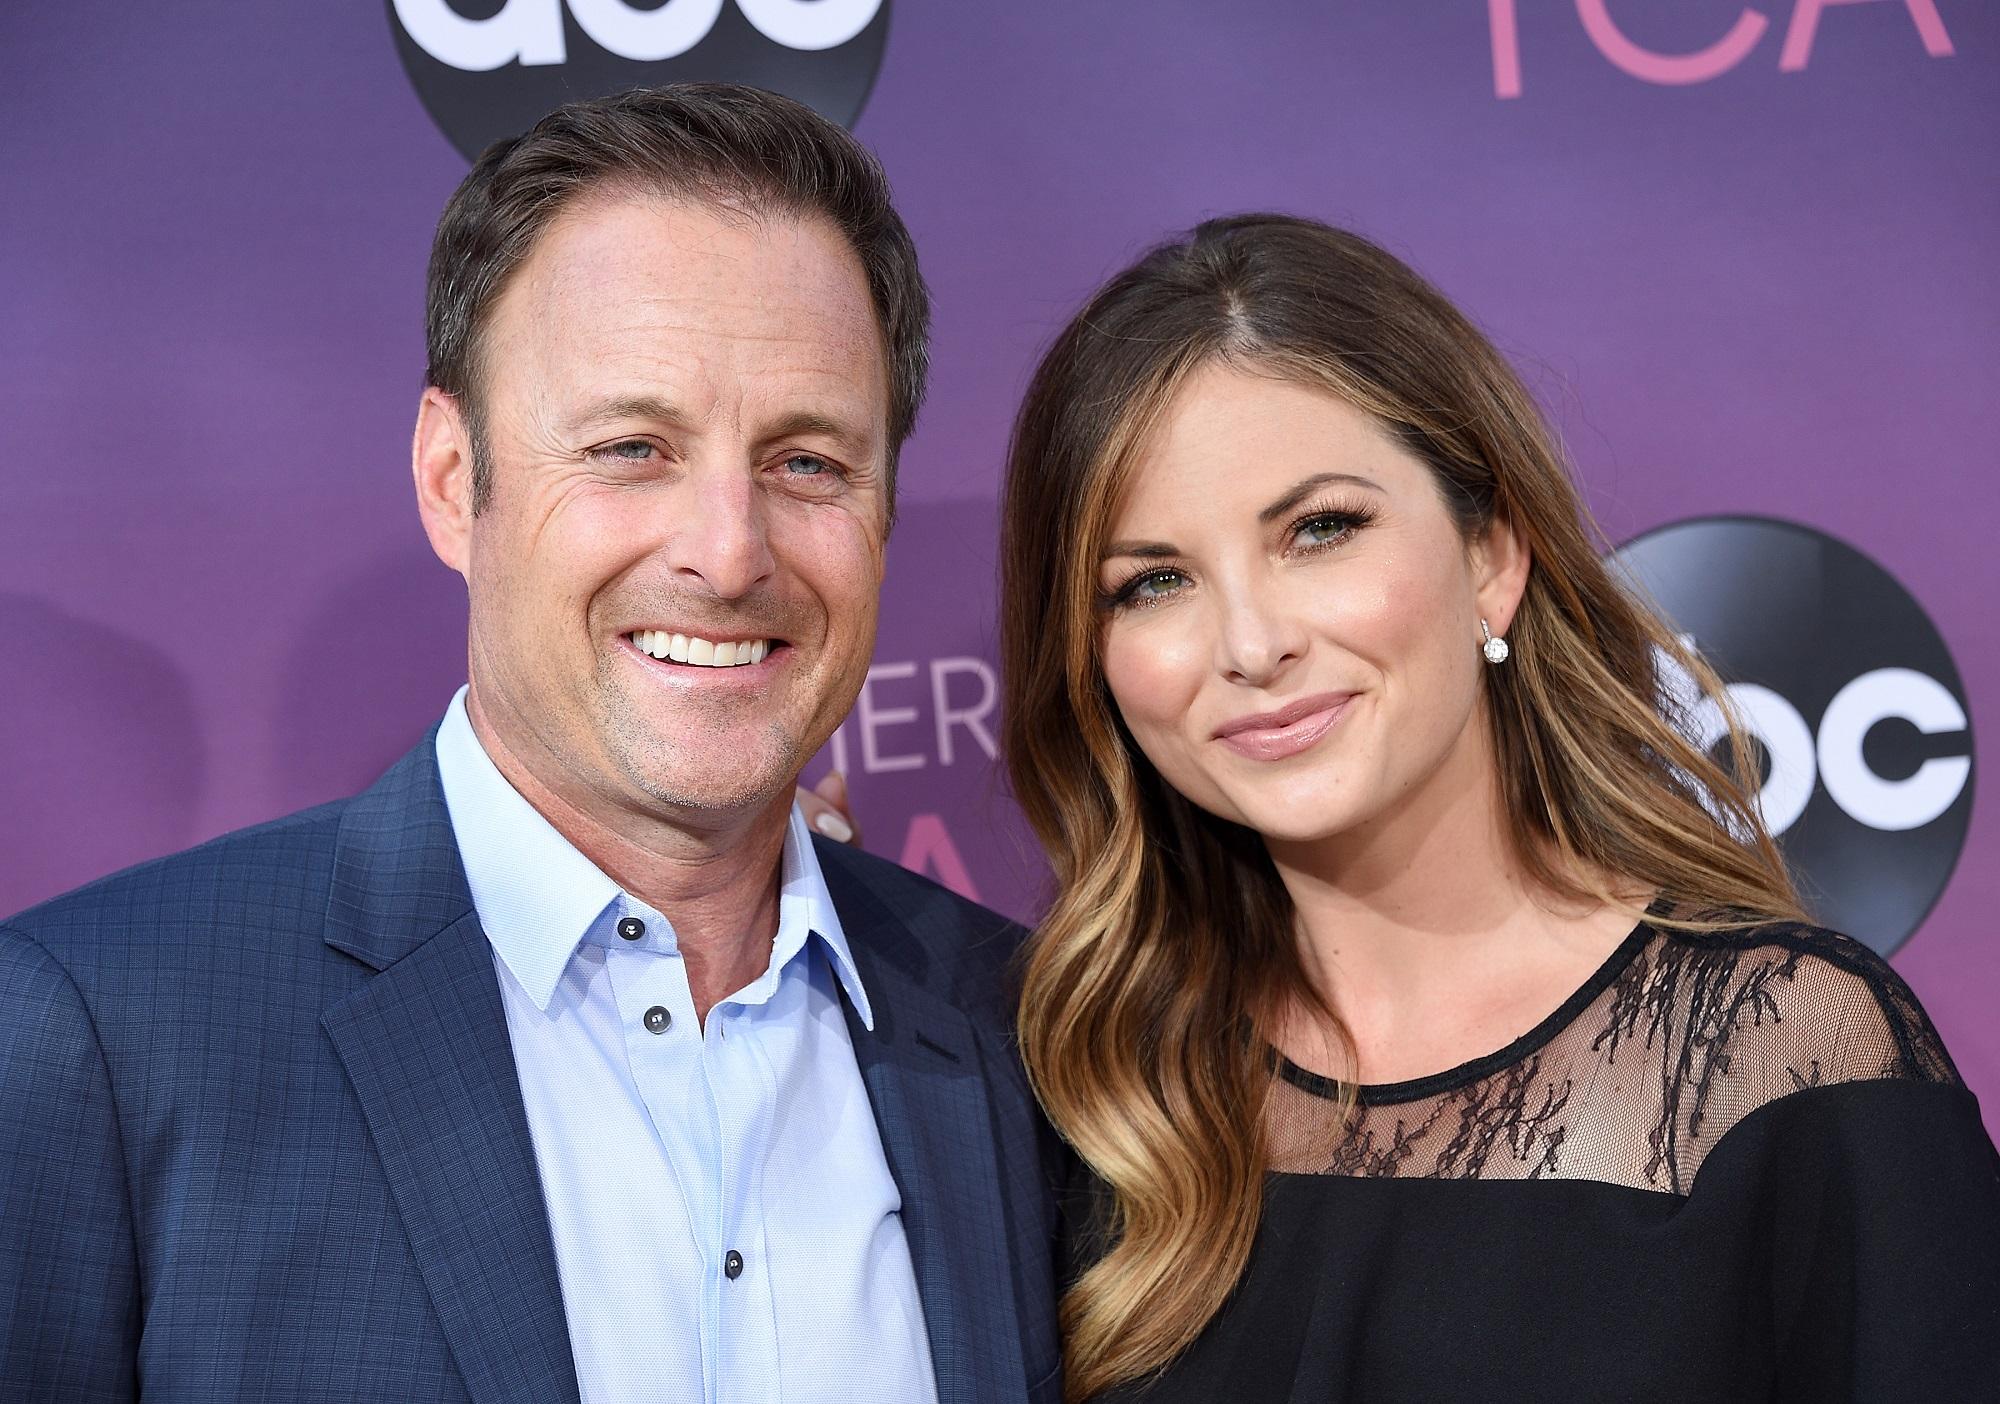 The Bachelor host Chris Harrison and girlfriend Lauren Zima